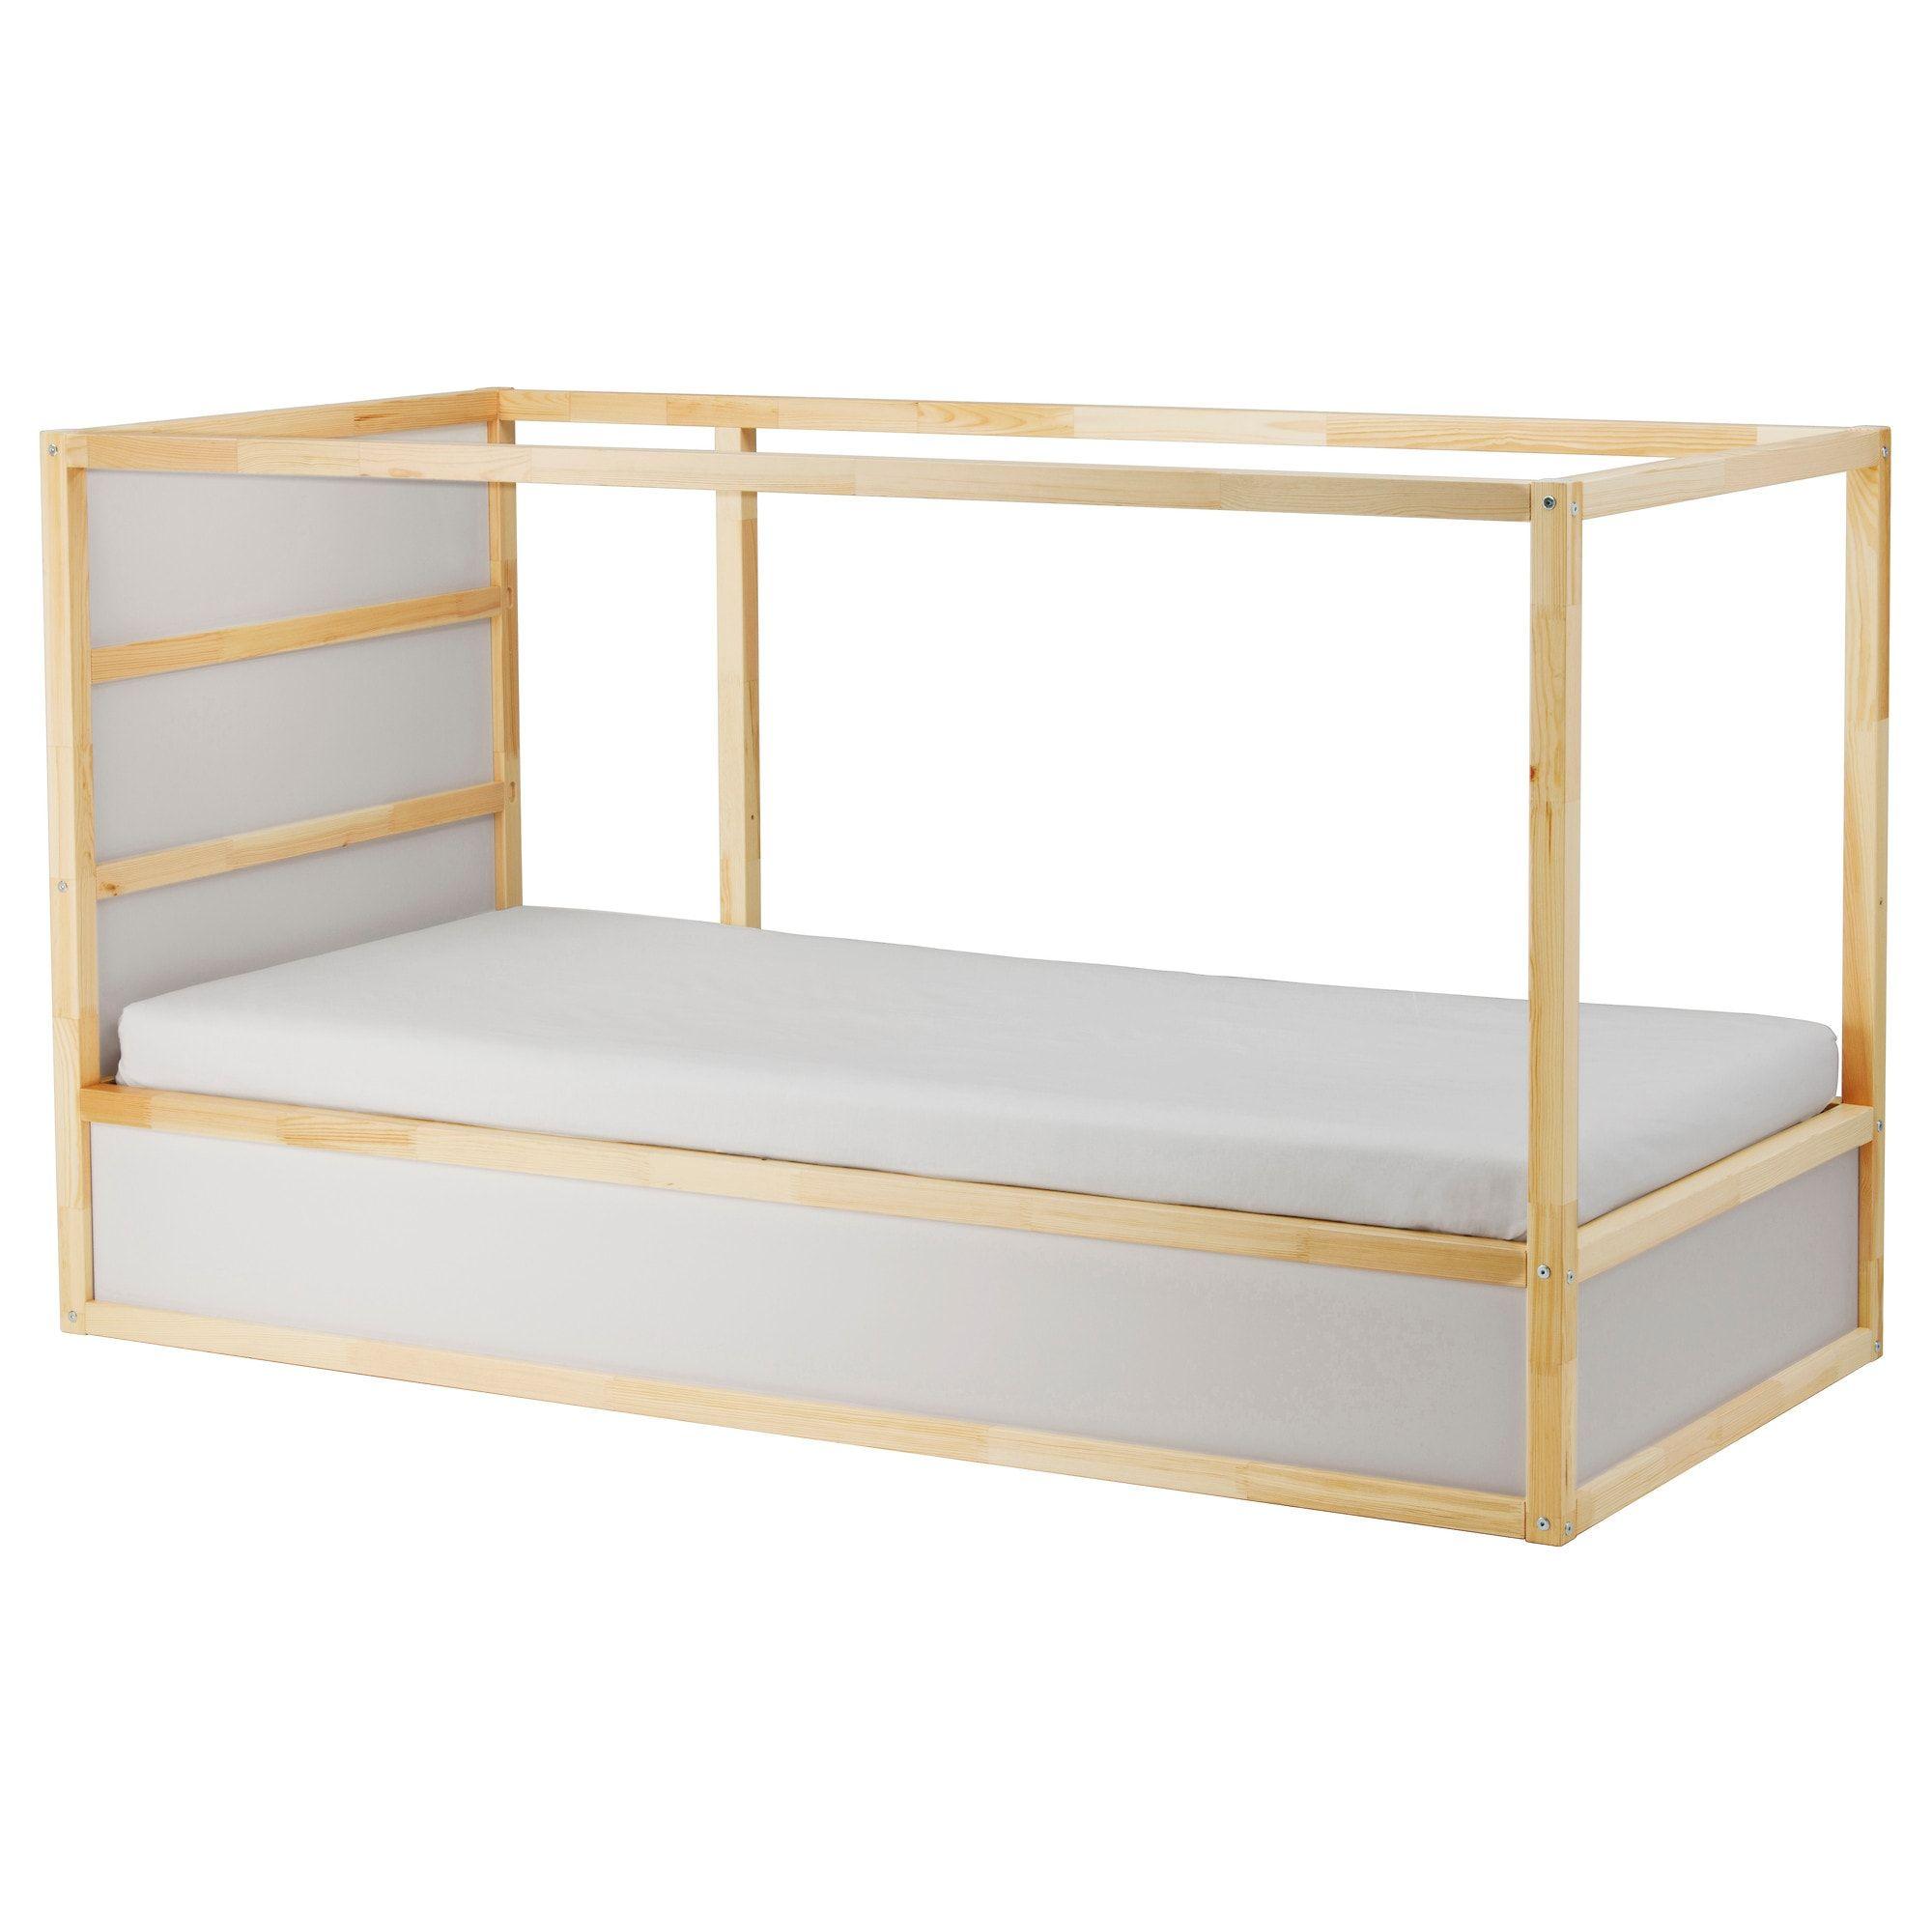 Kura Lit Reversible Blanc Pin 90x200 Cm Ikea In 2020 Loft Bed Frame Ikea Bed Ikea Kura Bed